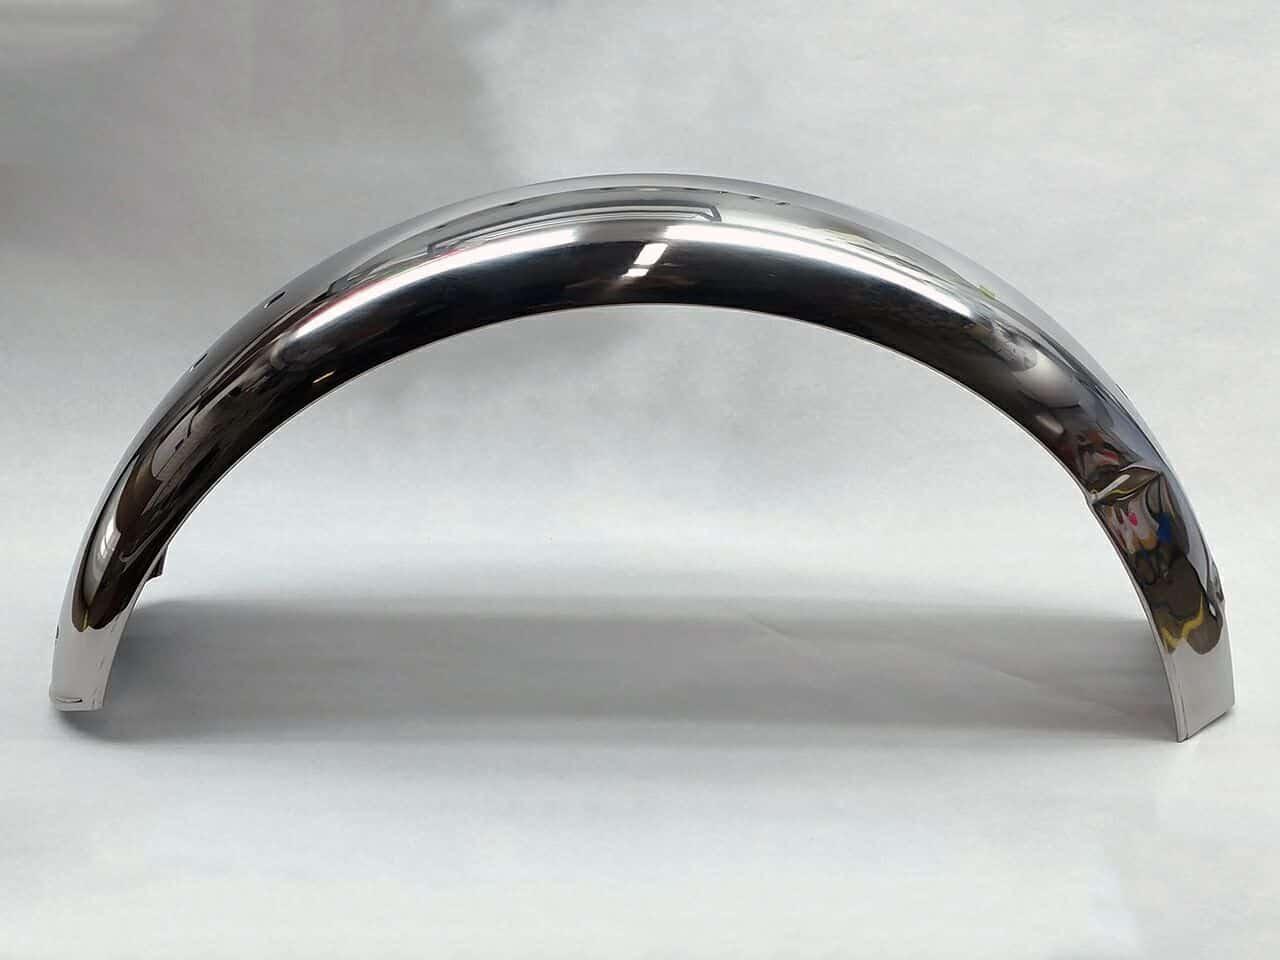 063887 Norton Commando rear mudguard - Classic Bike Spares